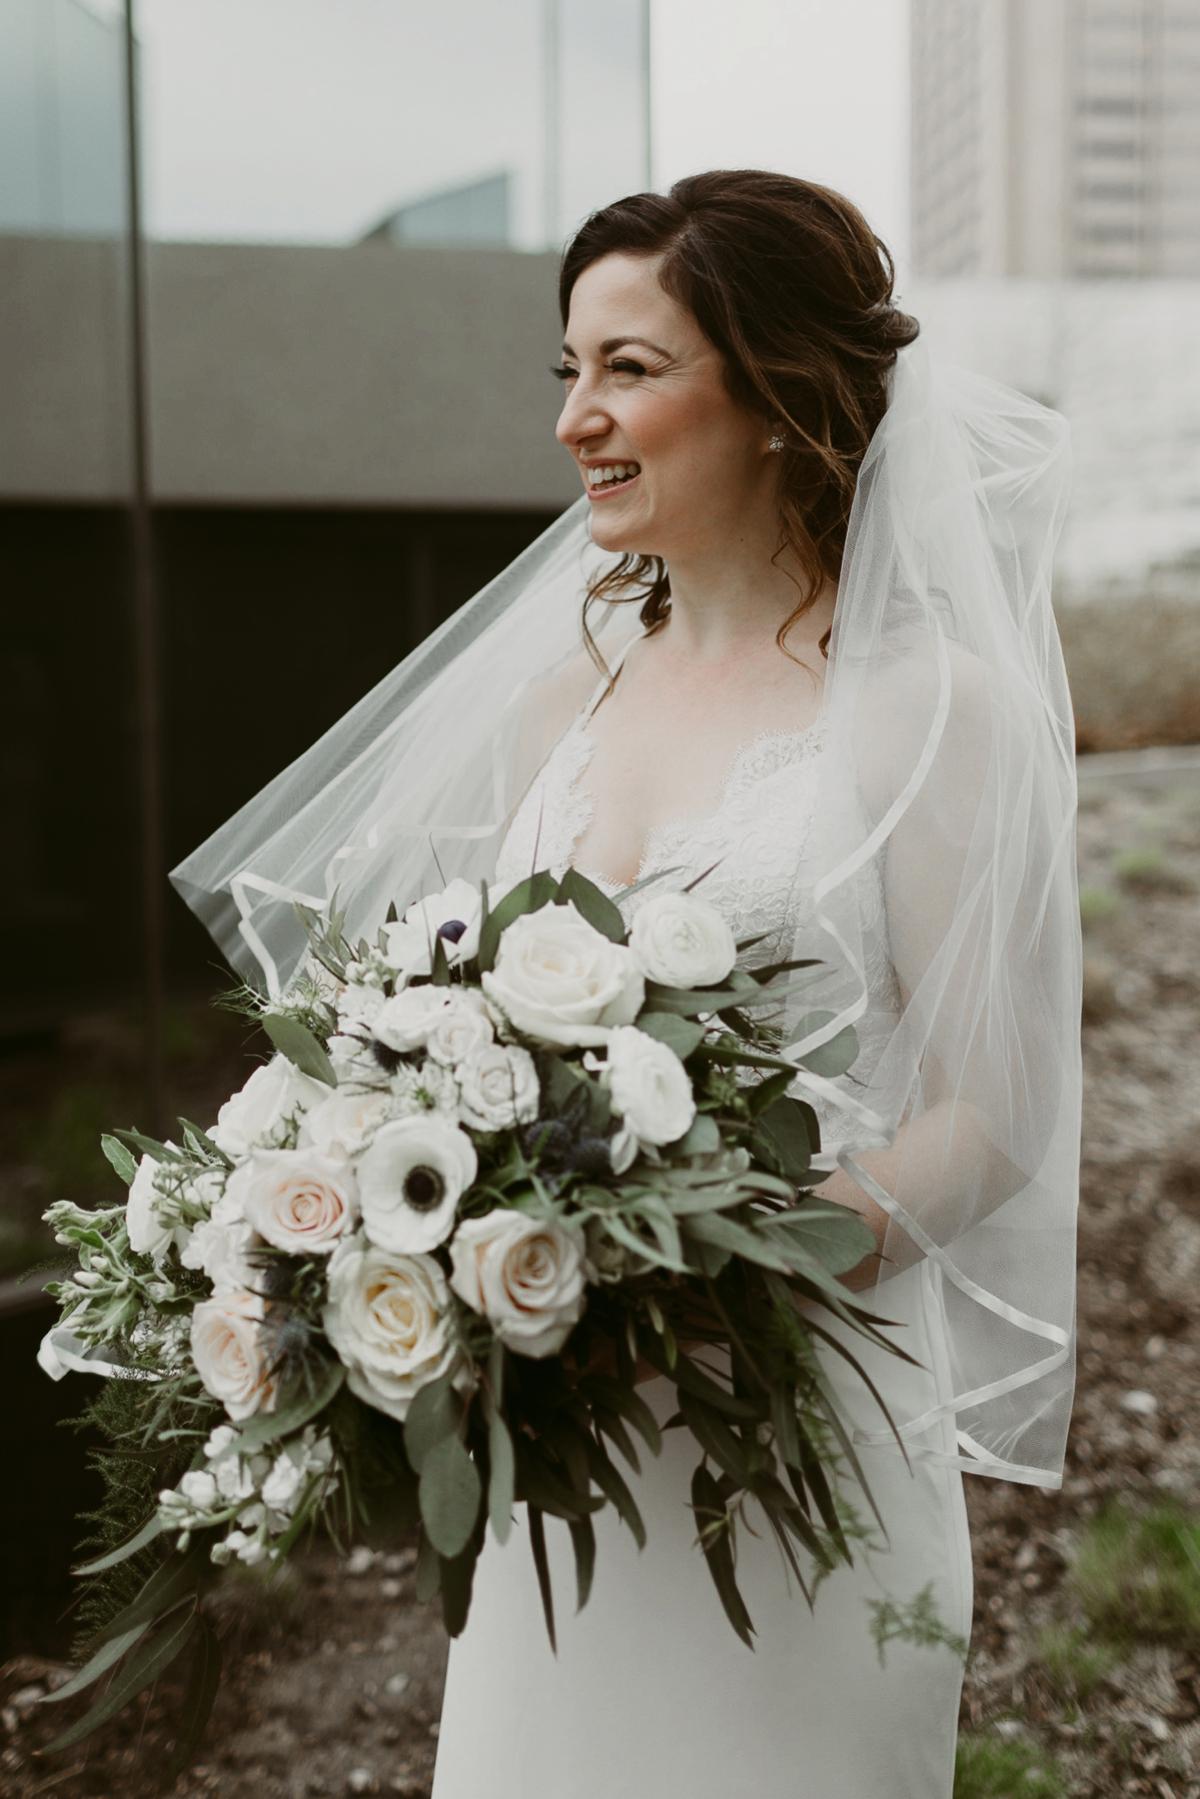 Rachel+Michael_Lake-Erie-Building-Cleveland-Wedding_M+J-Photographers-134.jpg